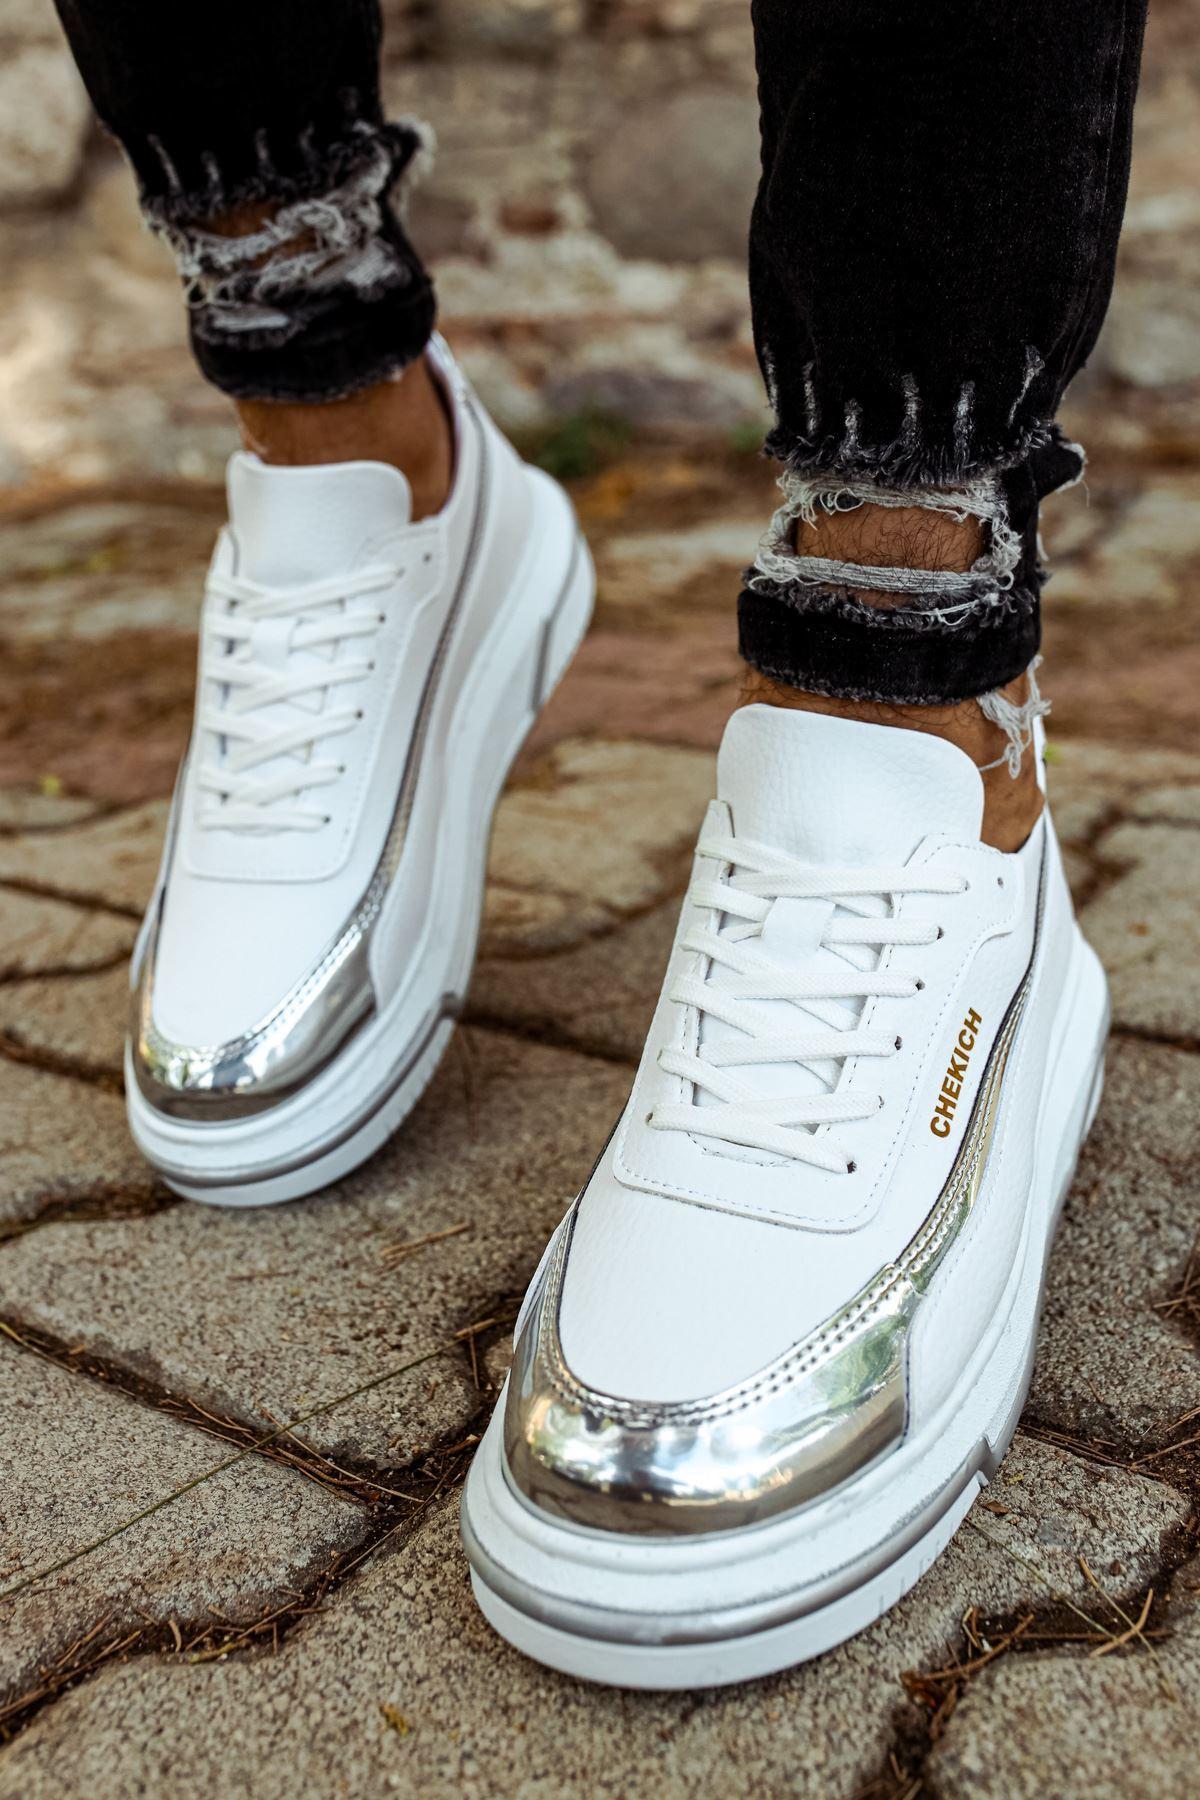 Chekich CH041 BT Erkek Ayakkabı BEYAZ/GUMUS